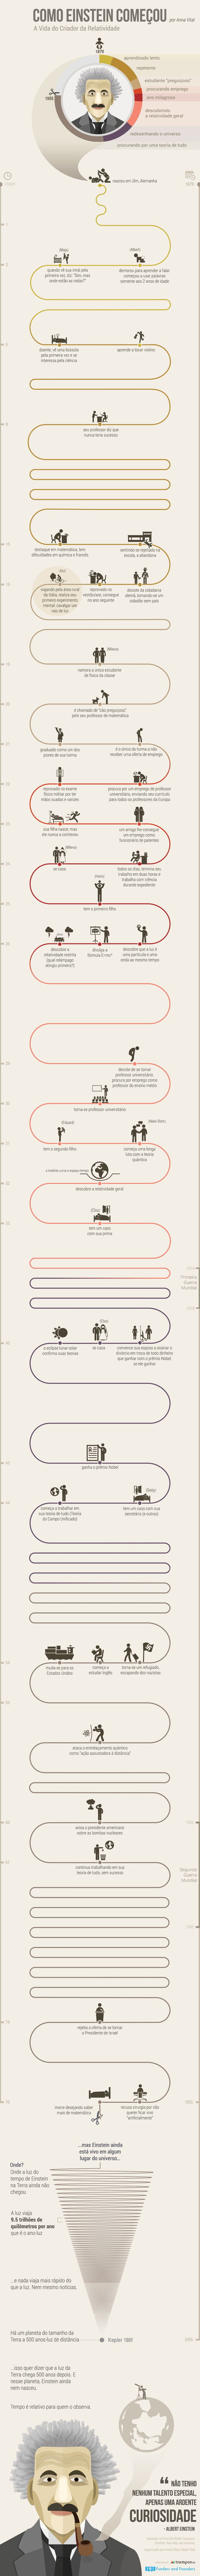 Infográfico: como Einstein começou